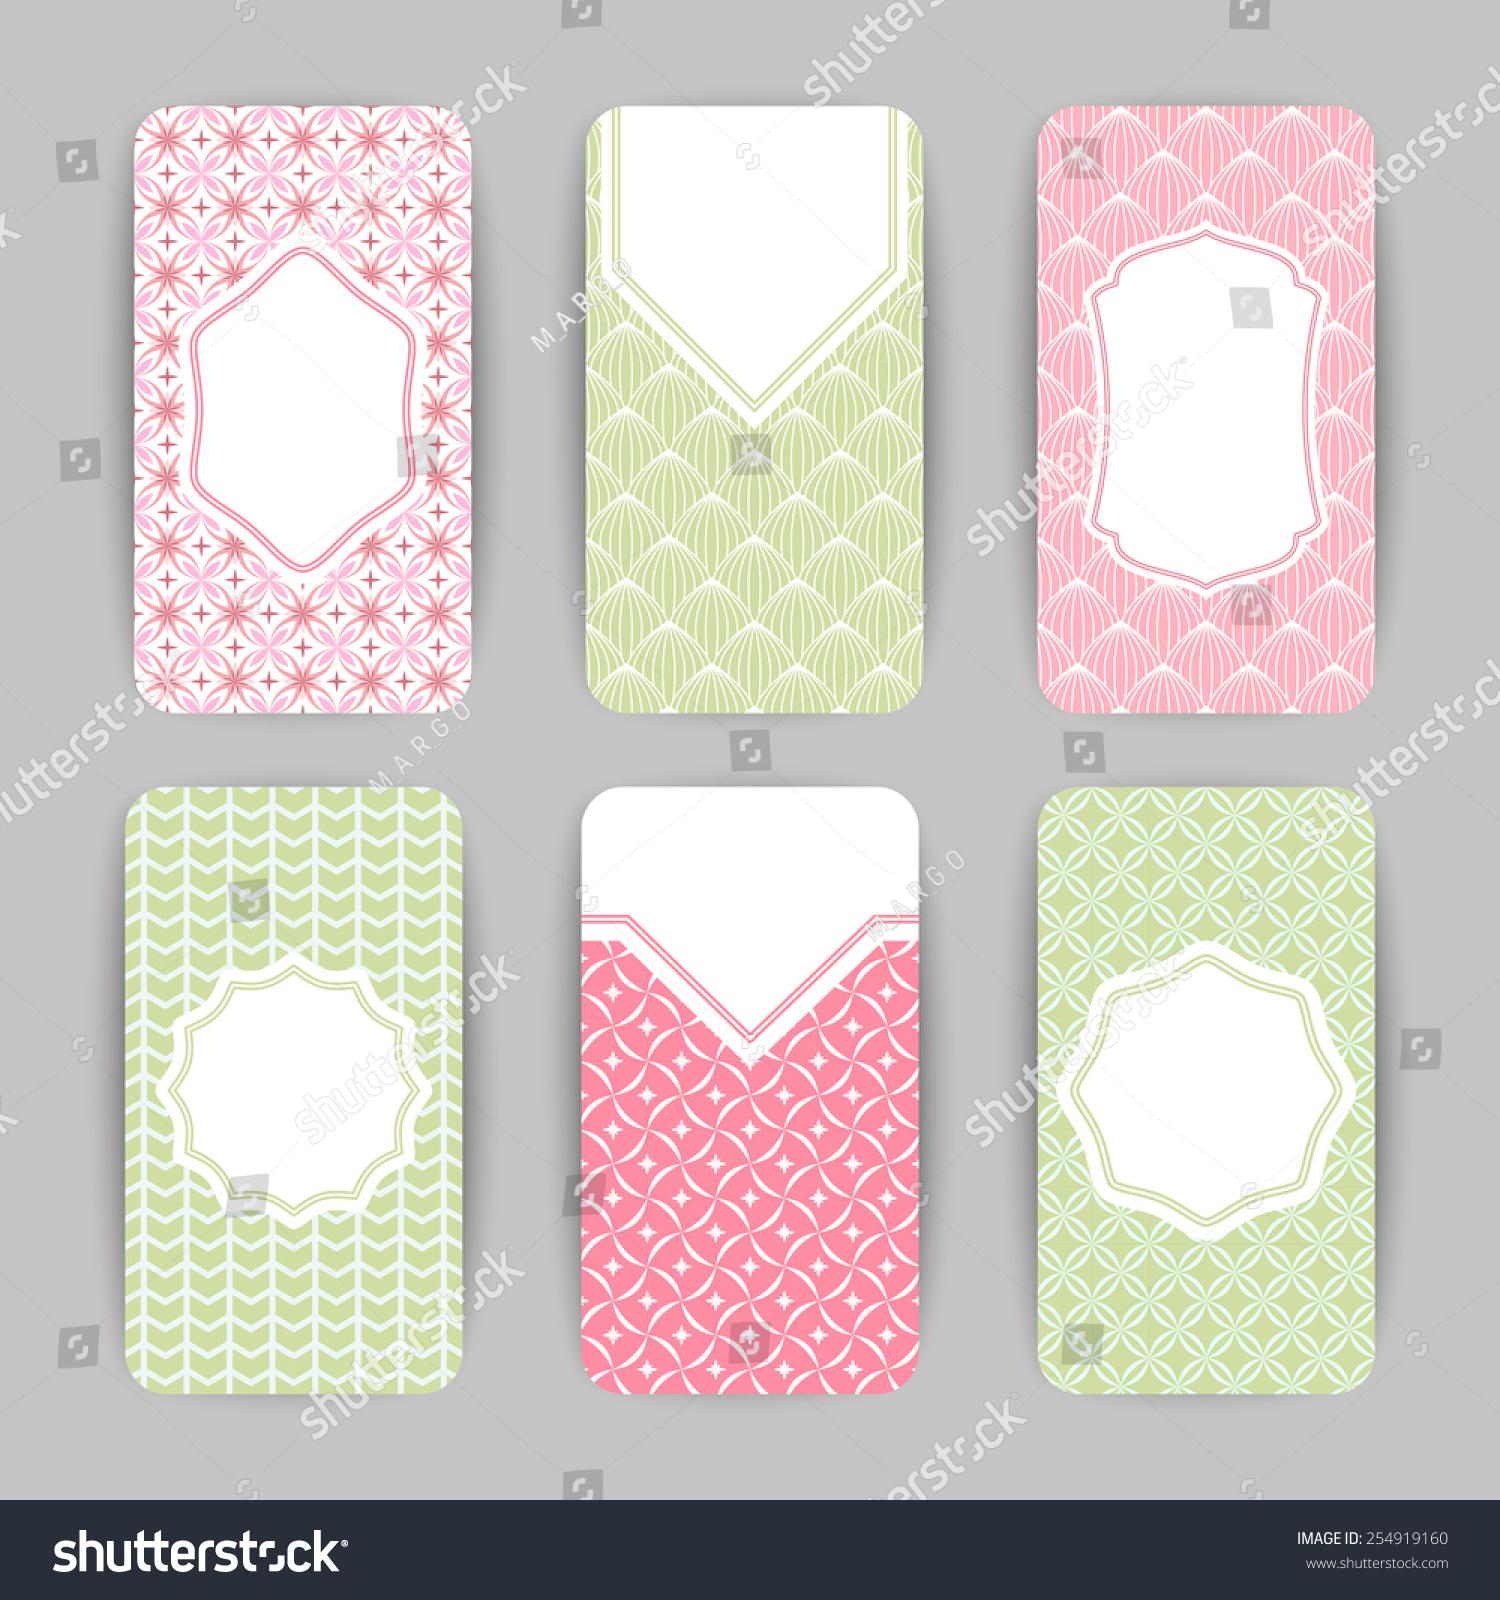 Collection Vector Card Templates Geometric Ornament Stock Vector